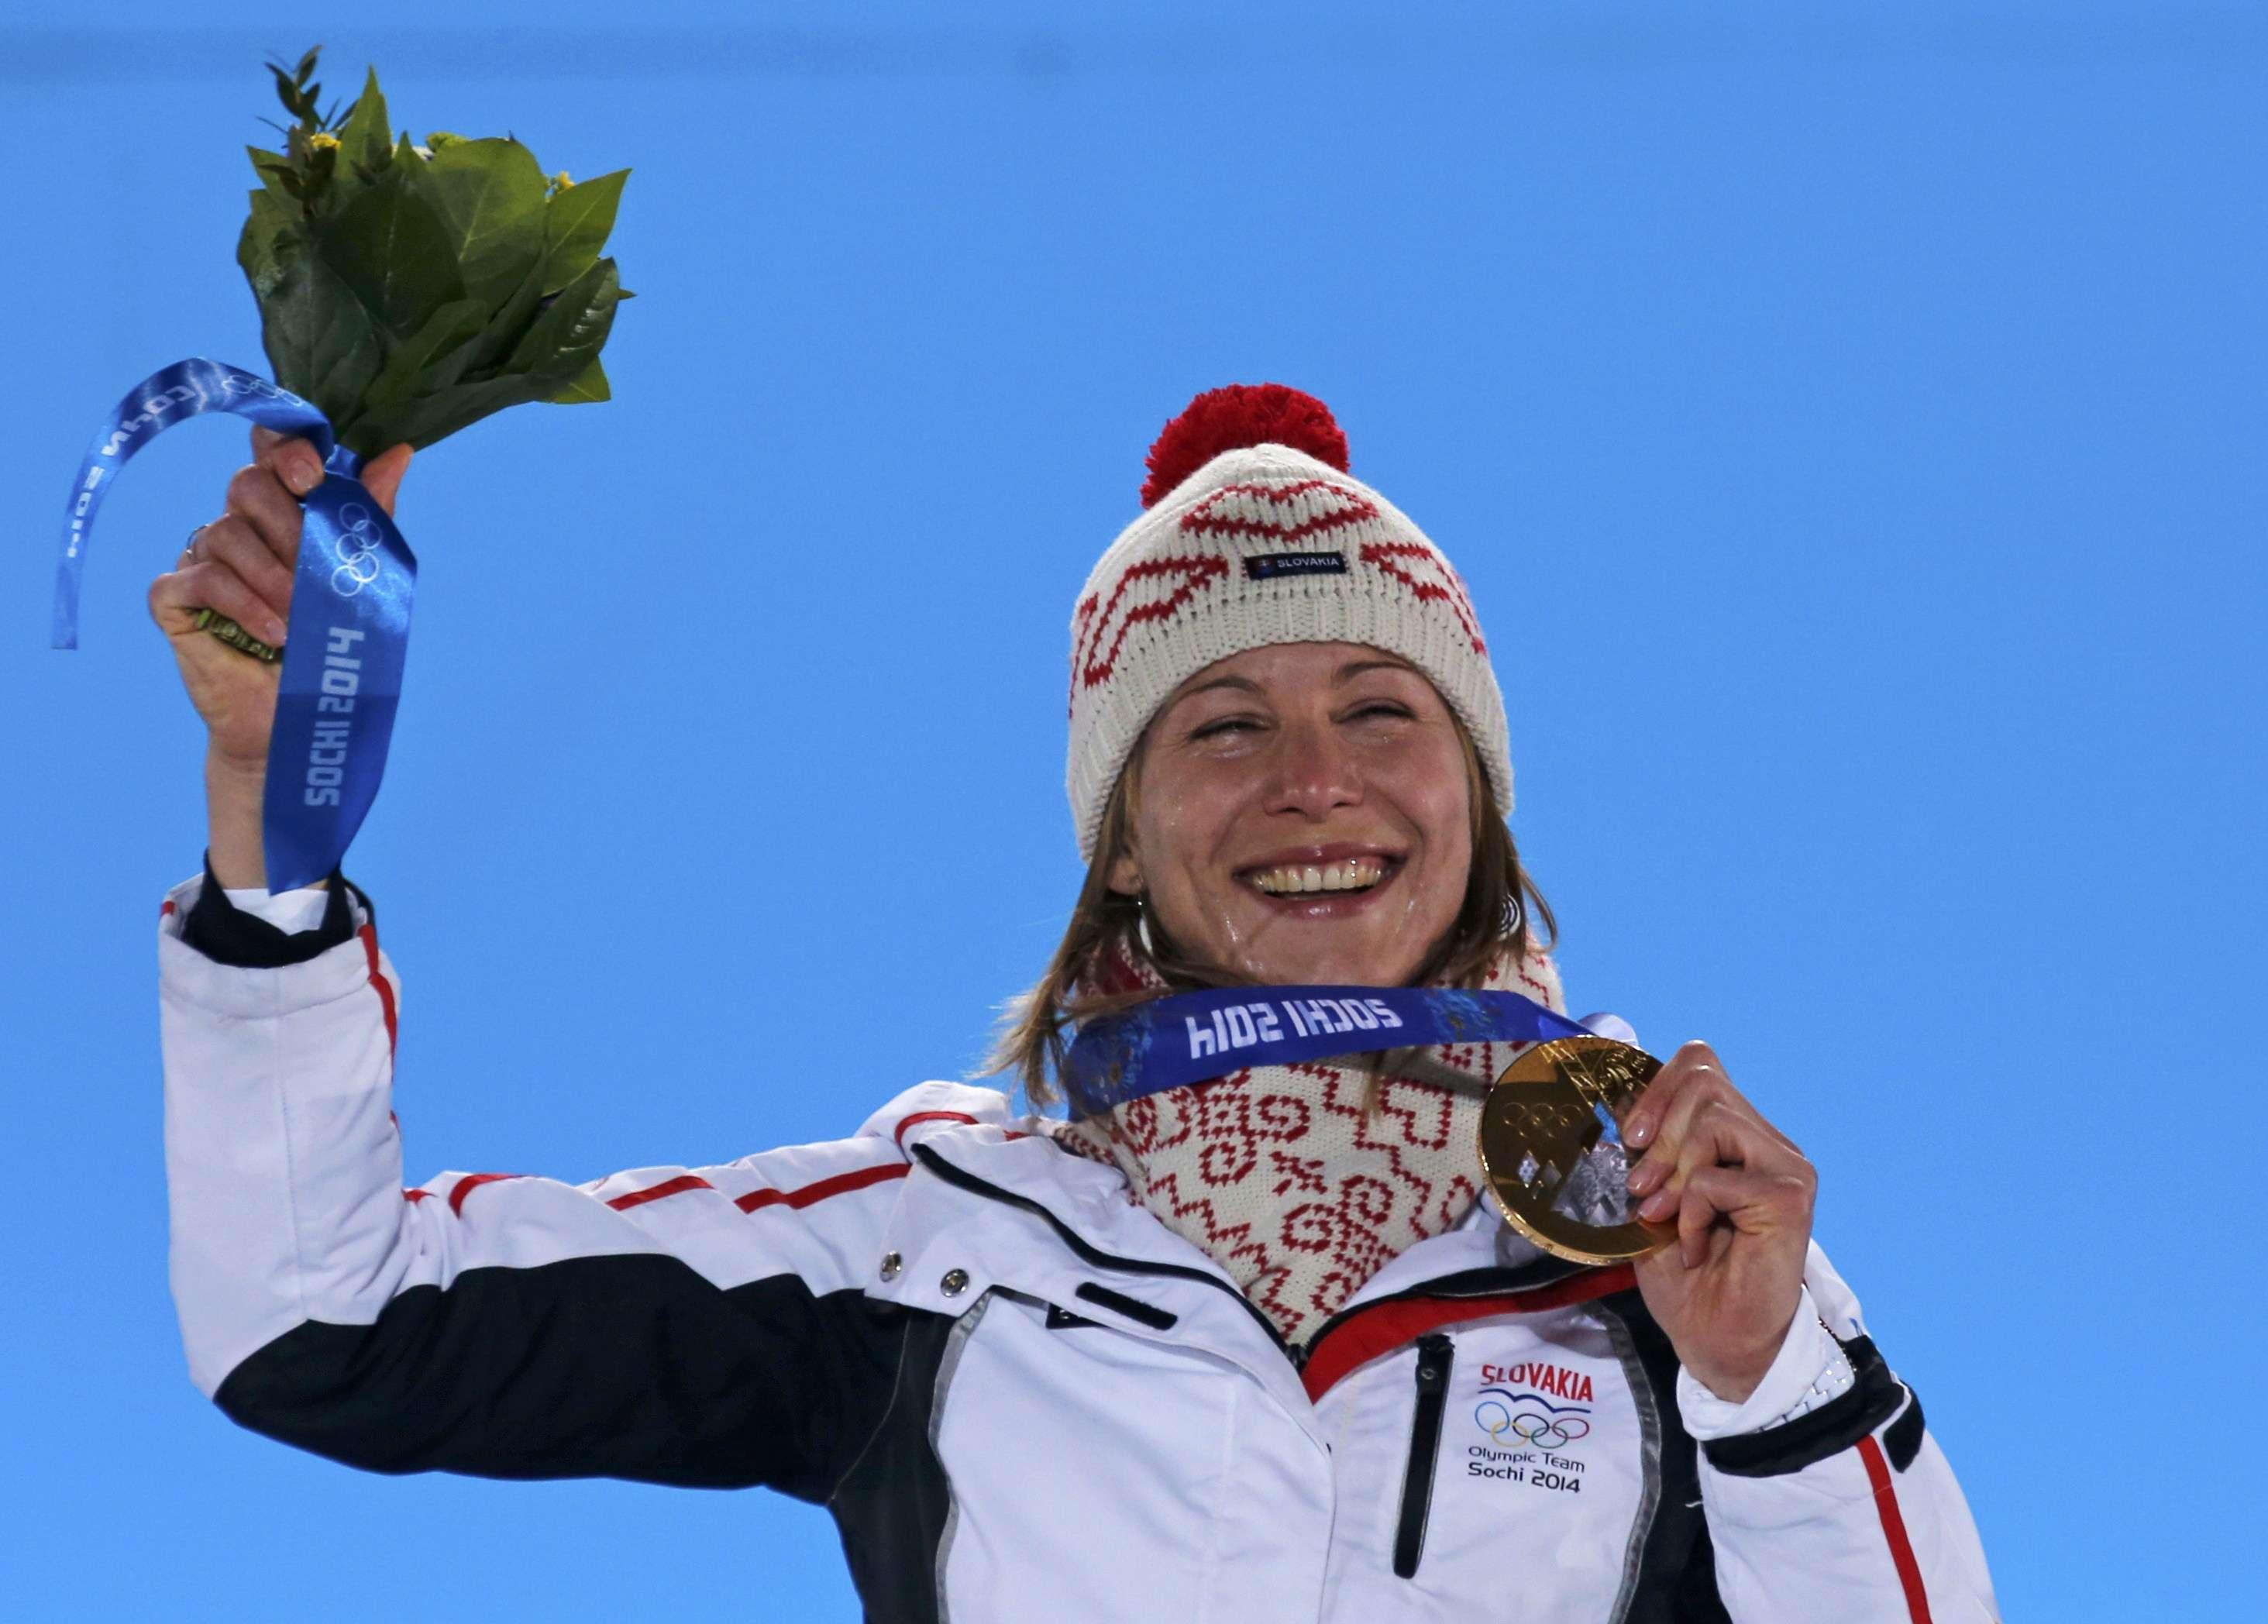 Российские спортсменки фамилия имя фото 17 фотография